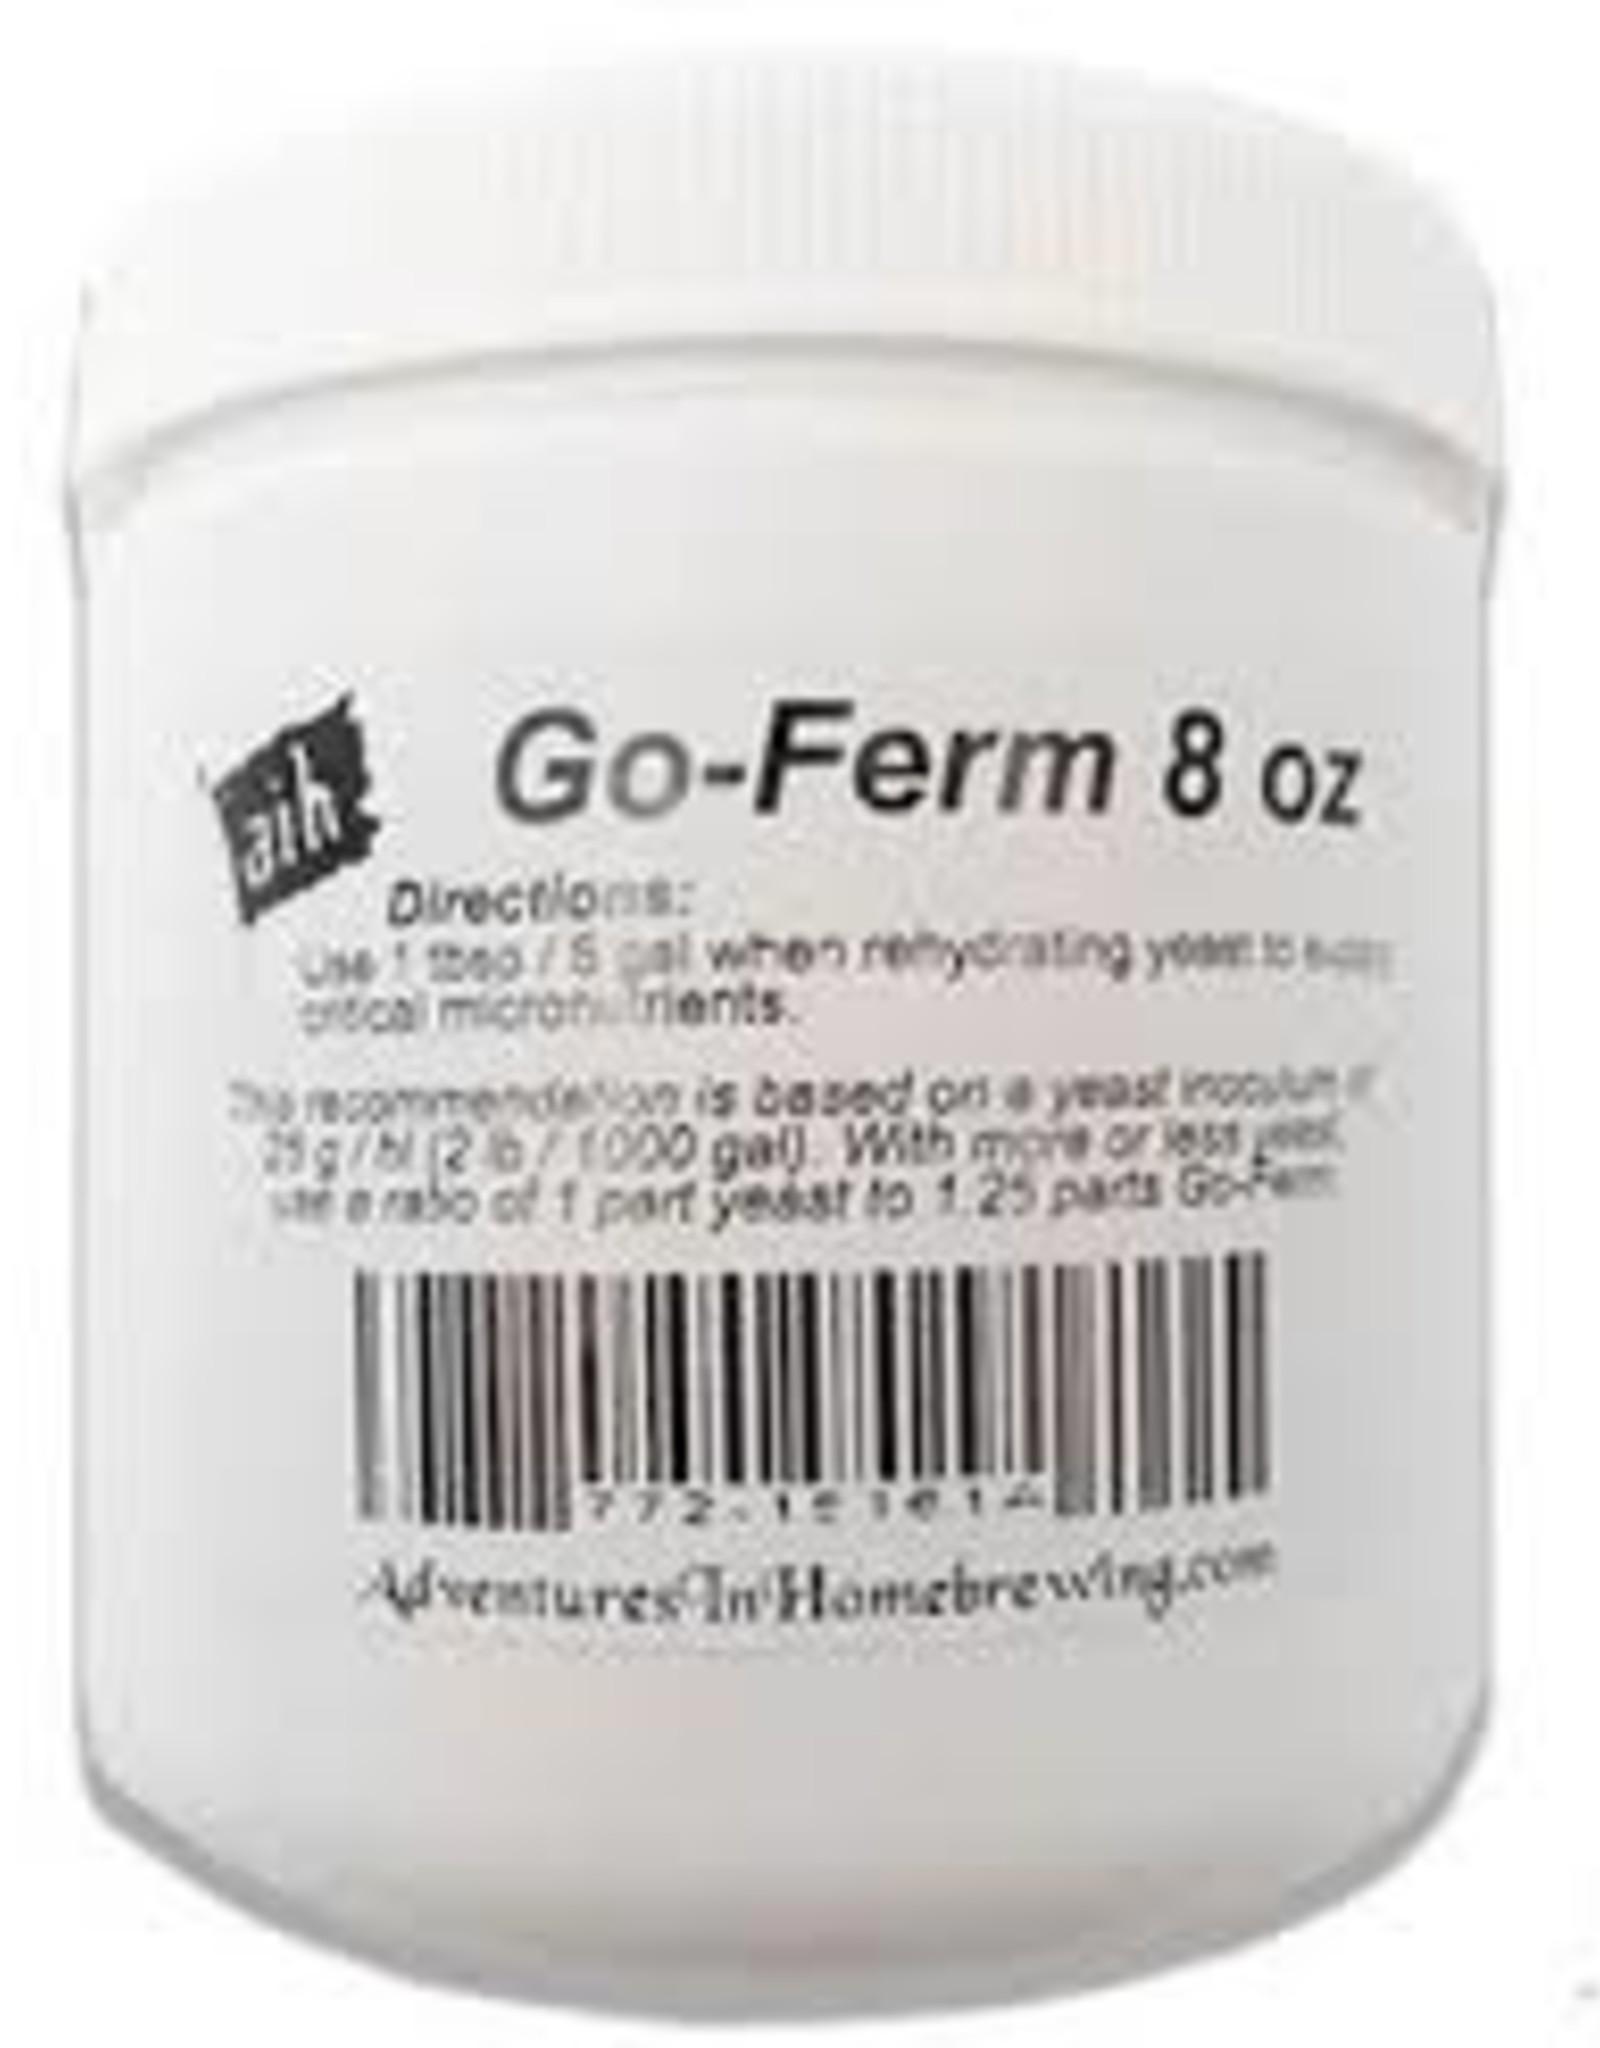 GO FERM 8 OZ